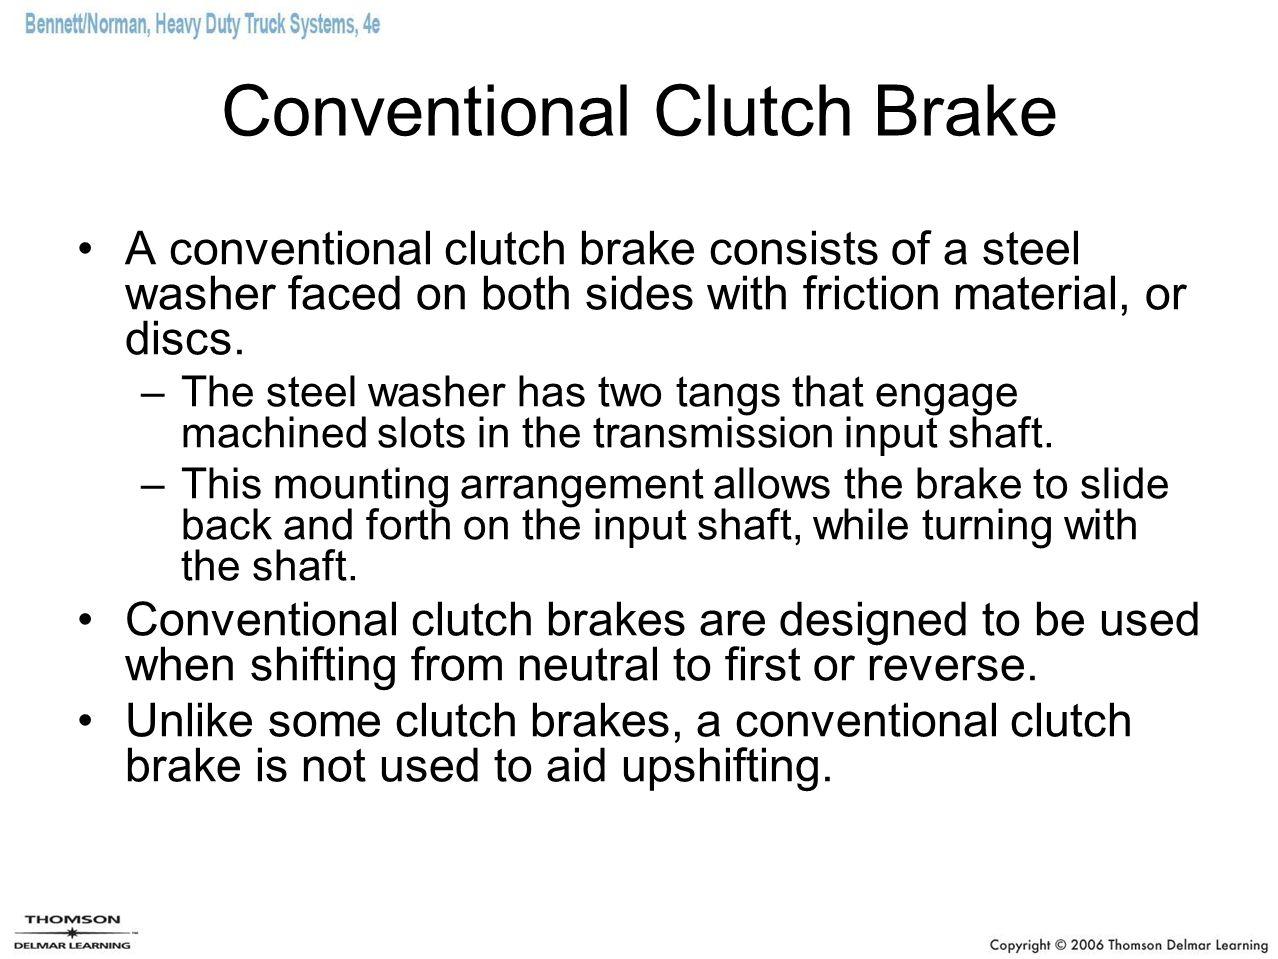 Conventional Clutch Brake